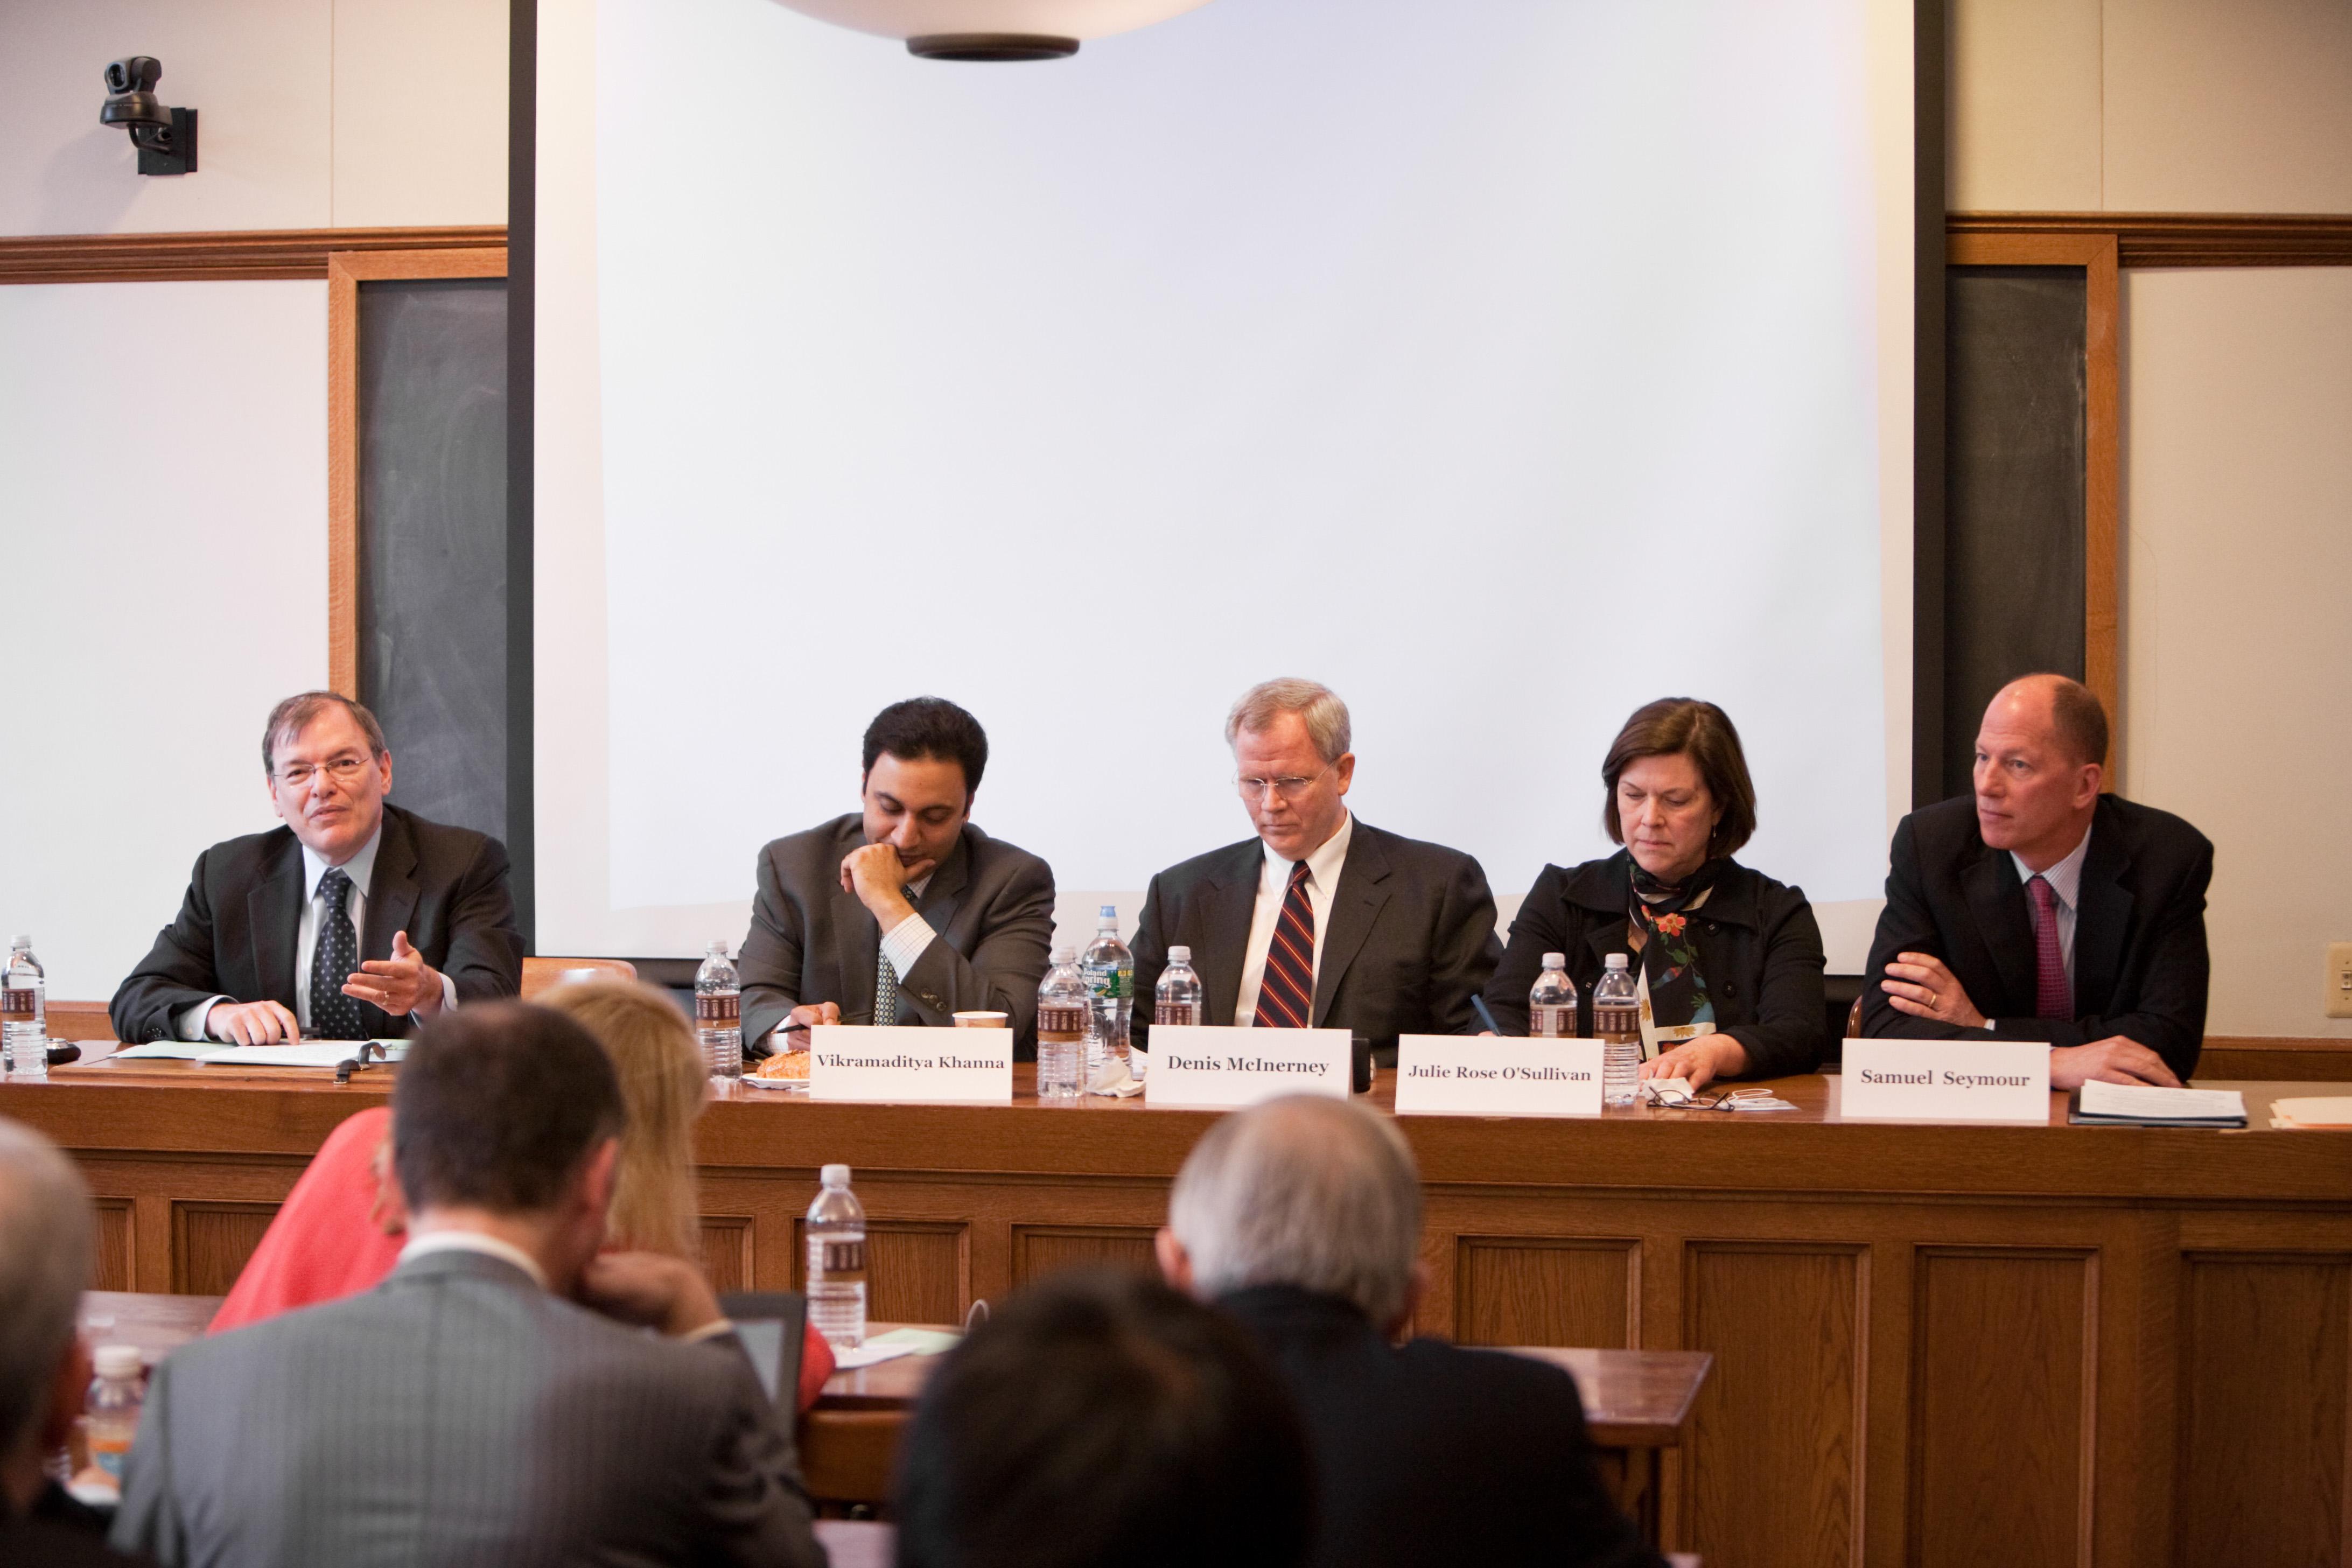 Hon. Gerard Lynch, Michigan Law Prof. Vic Khanna, Denis McInerney, Georgetown Law Prof. Julie O'Sullivan, and Samuel Seymour